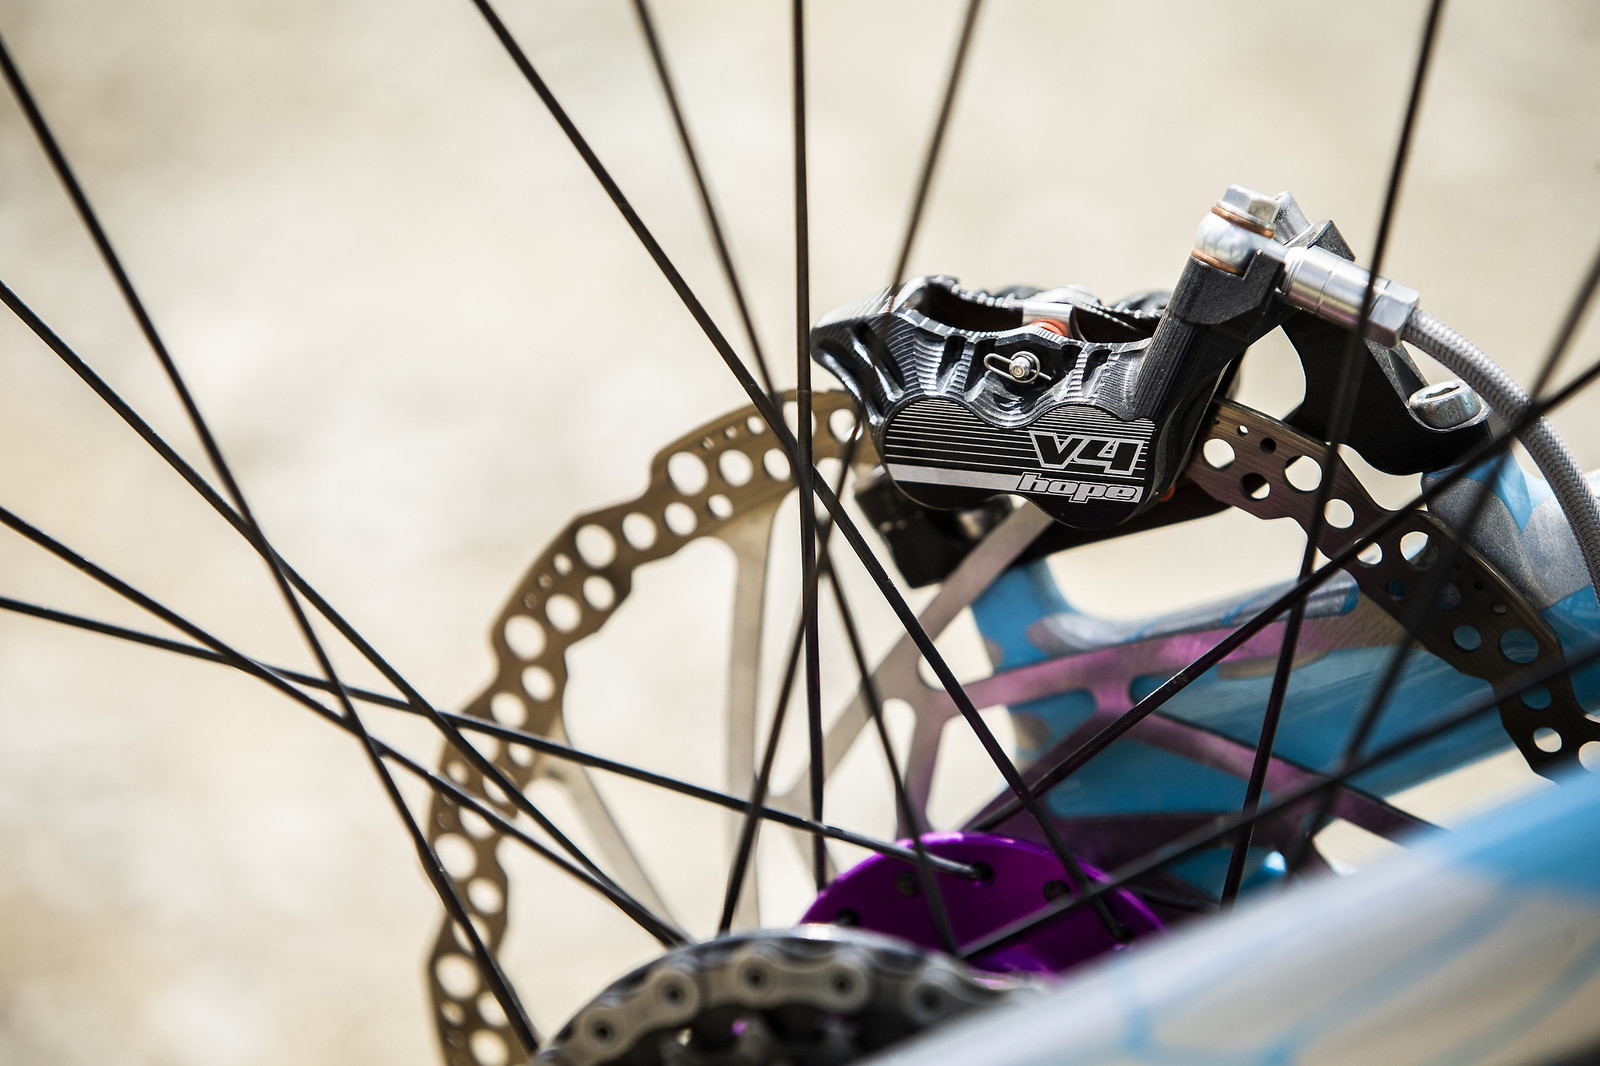 Hope Tech 3 V4 Brakes - WINNING BIKE - Rachel Atherton's Trek Session - Mountain Biking Pictures - Vital MTB